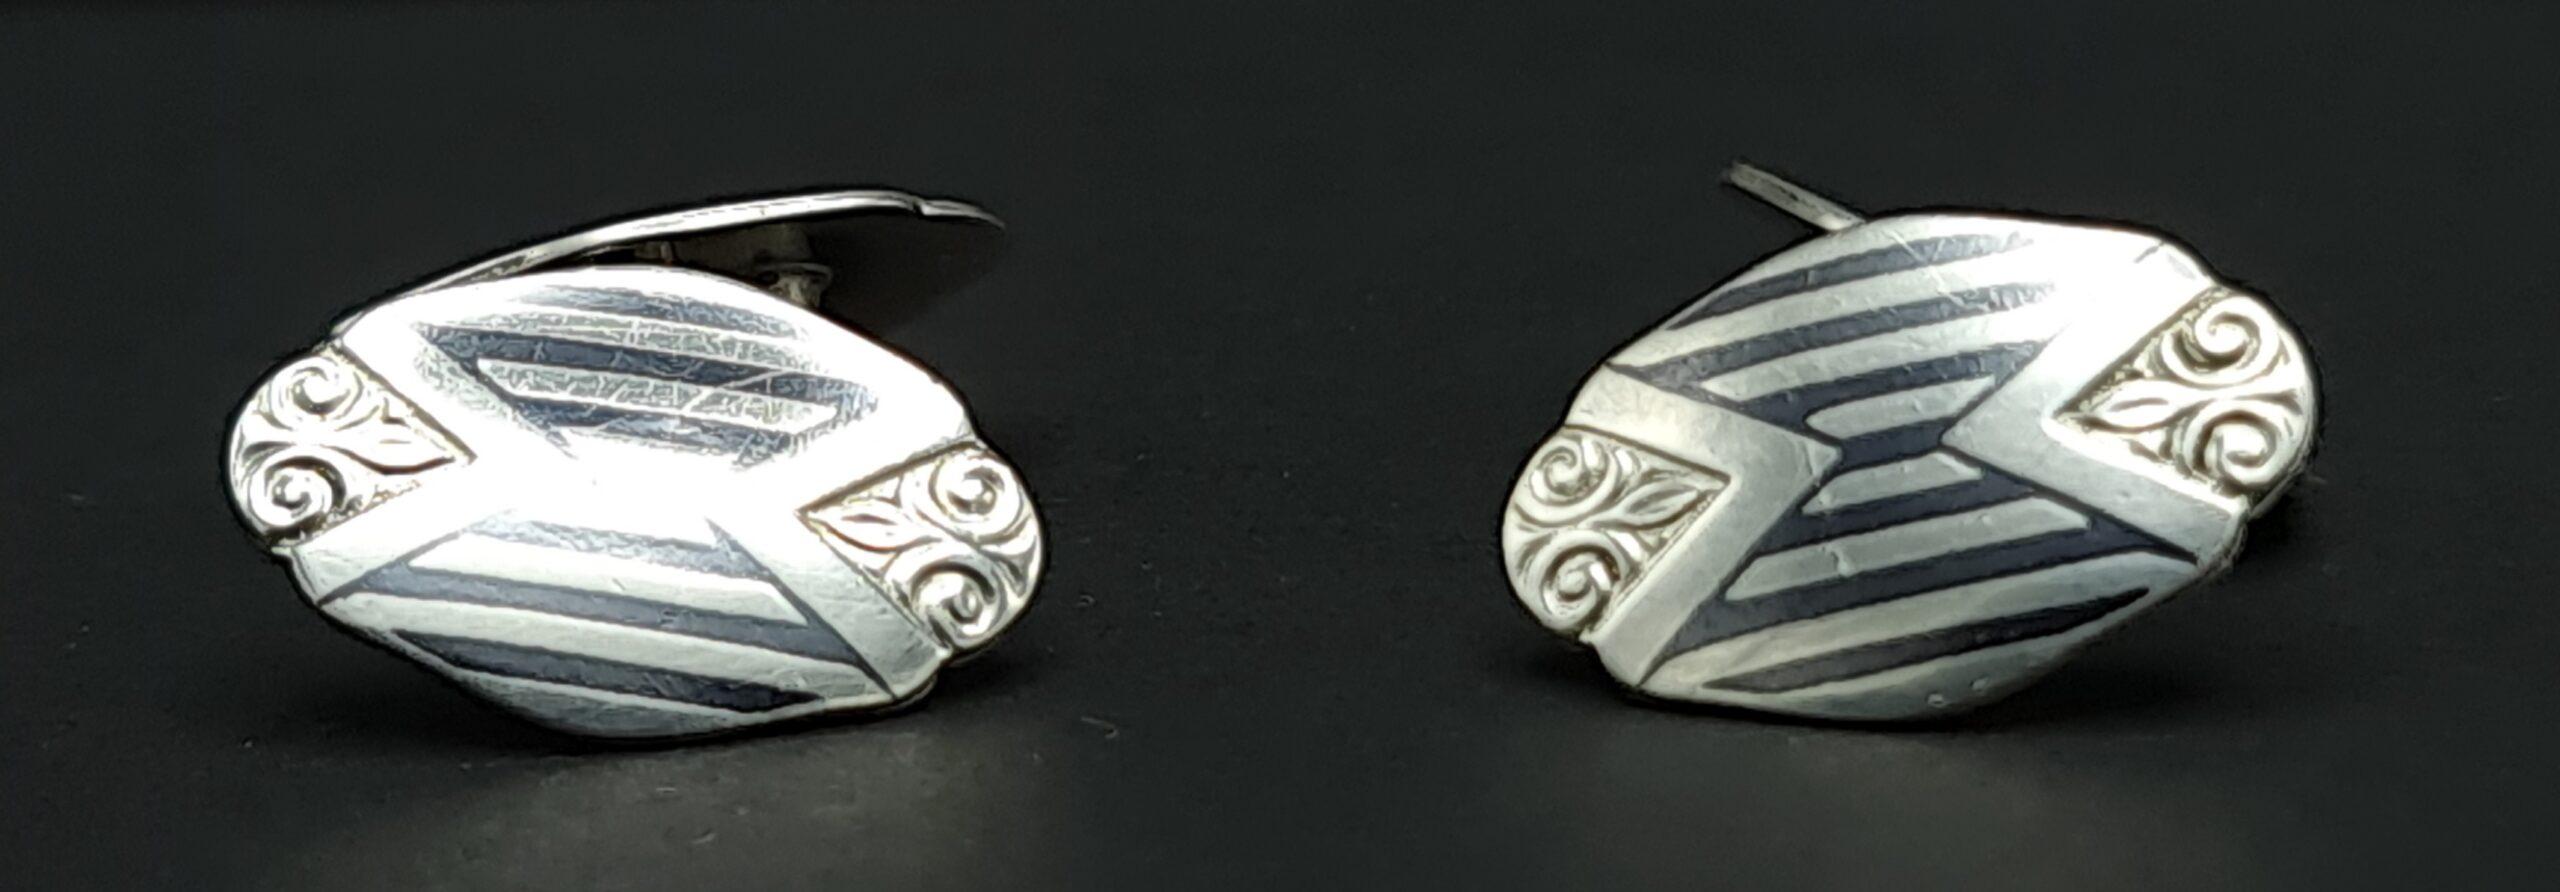 djokja manchetknopen ps800 manchetknopen niello silver cufflinks niello zilver thailand niello silver skoander.com